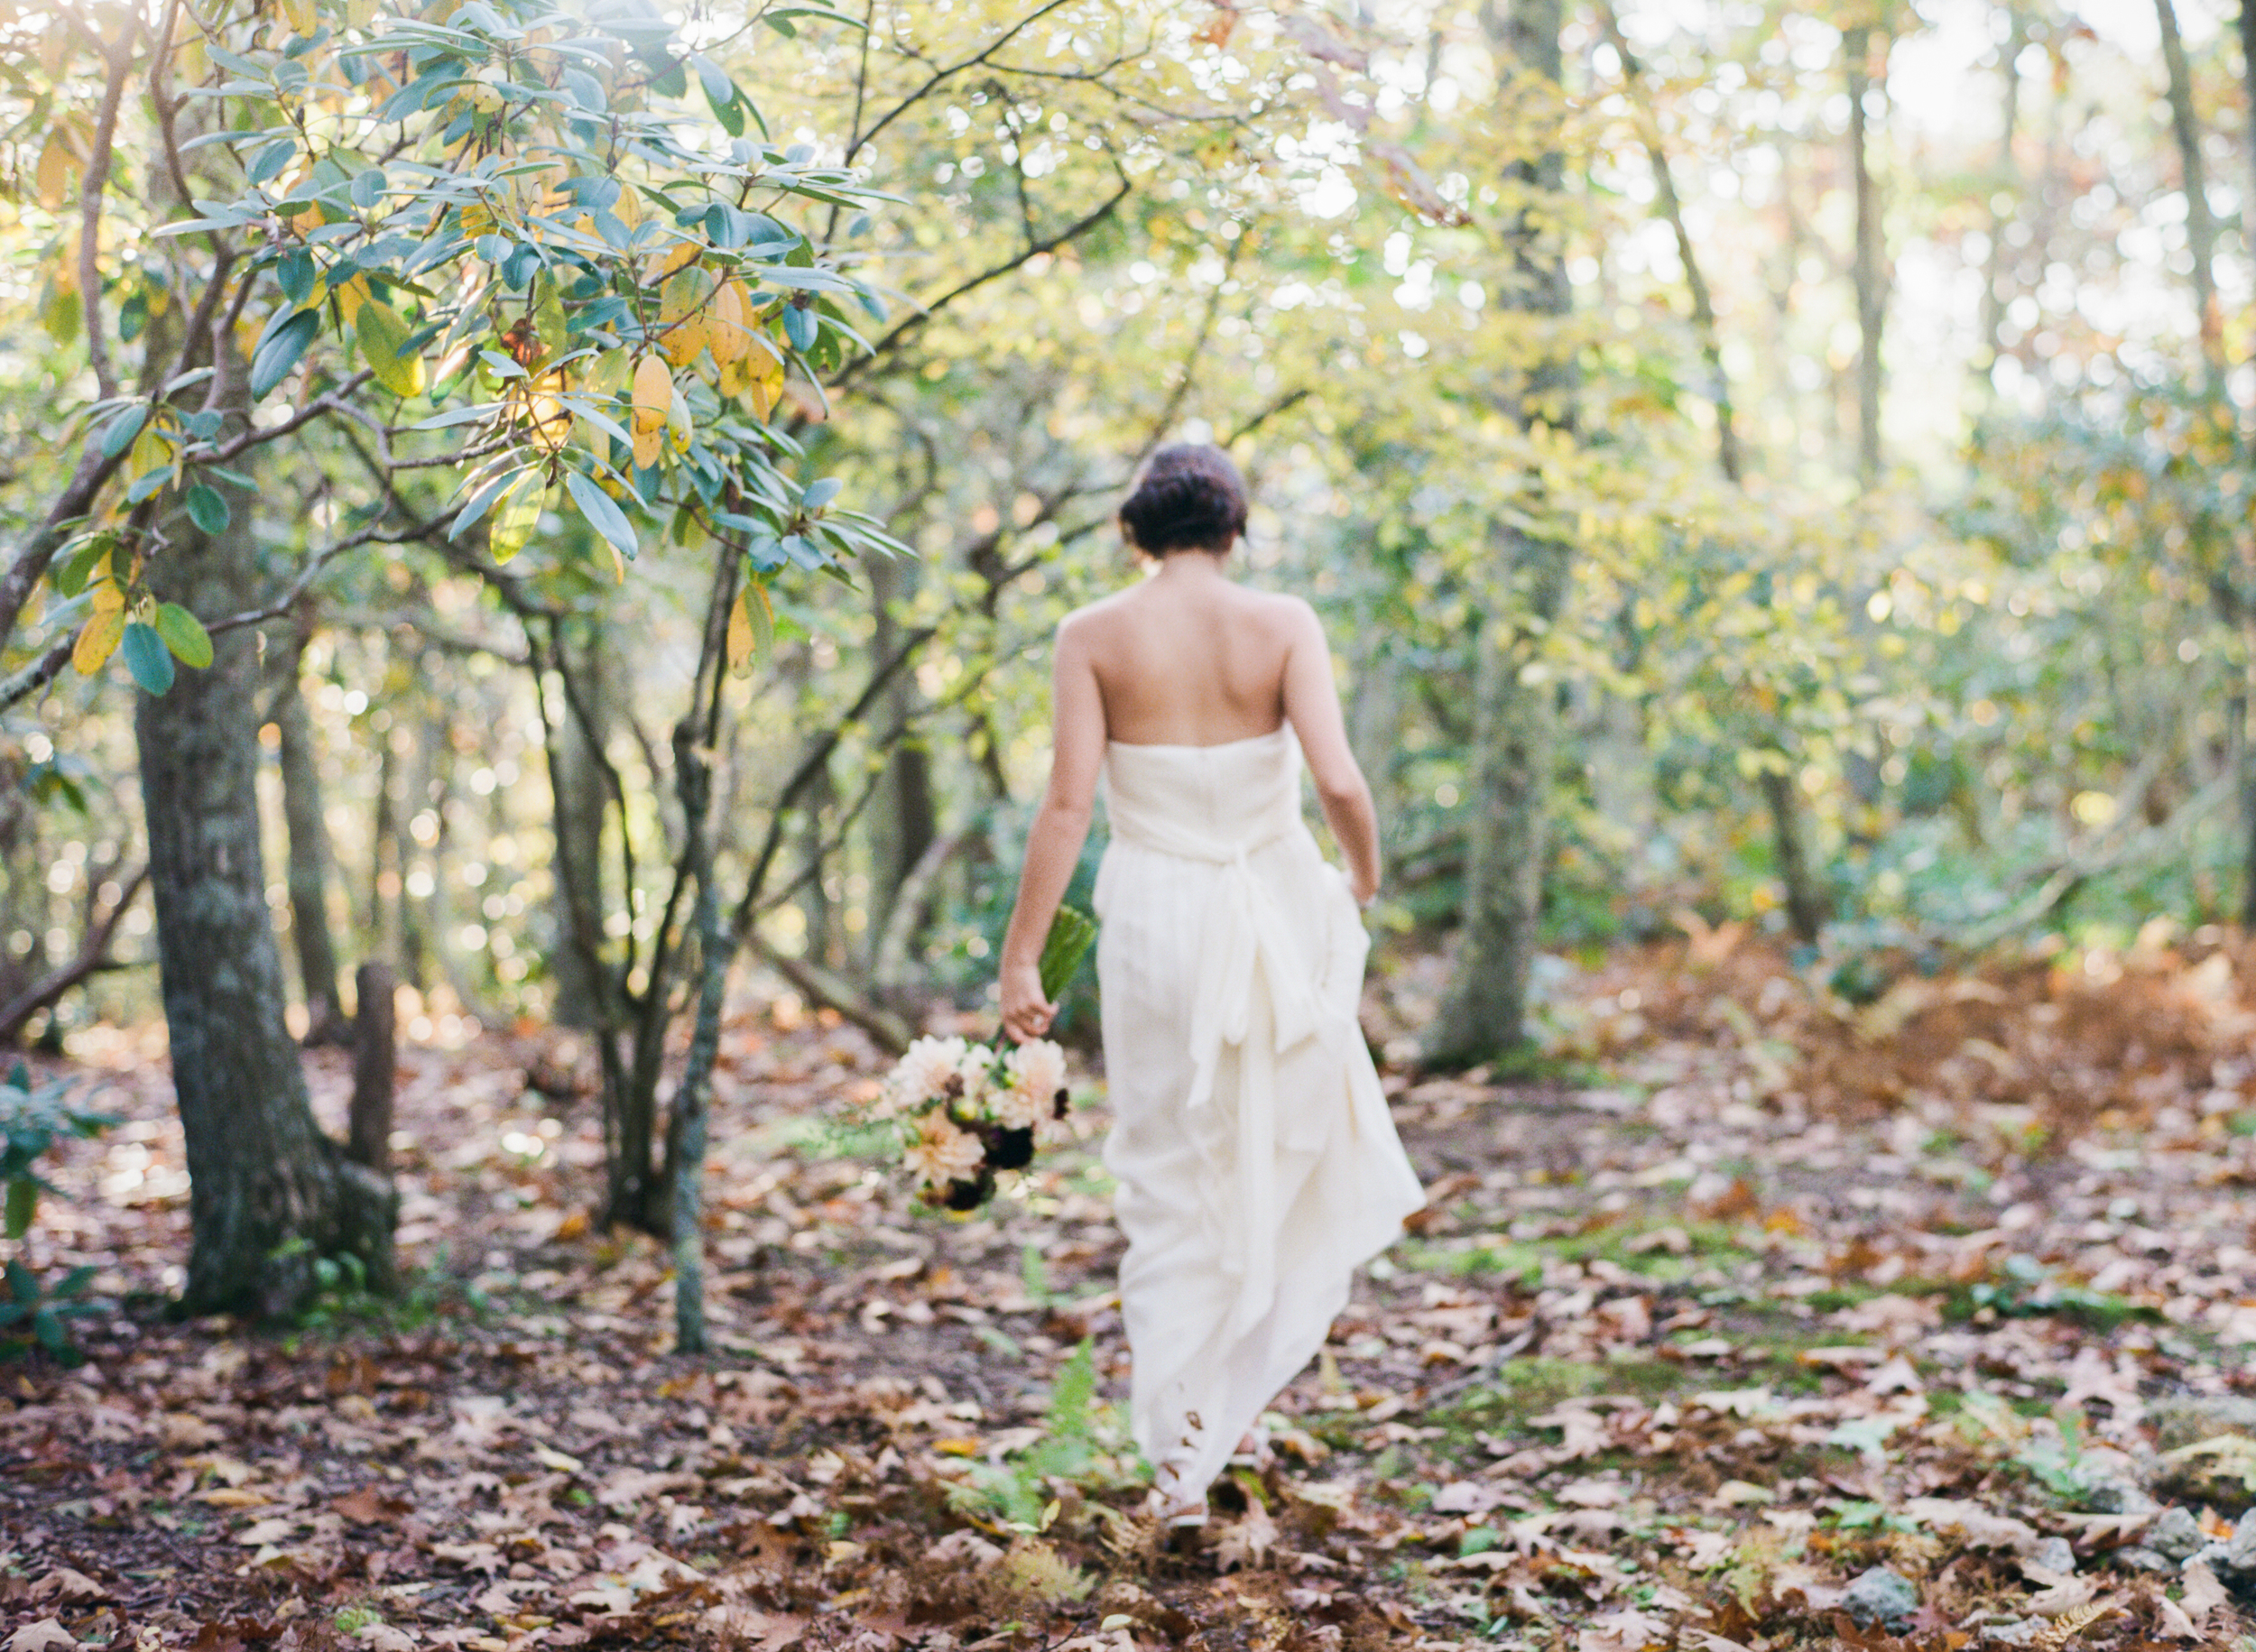 Bridal Inspiration_Virginia Mountain Fall Bride_Zachary_Taylor_Fine_Art_Film_Destination_Wedding_Photographer-19.jpg